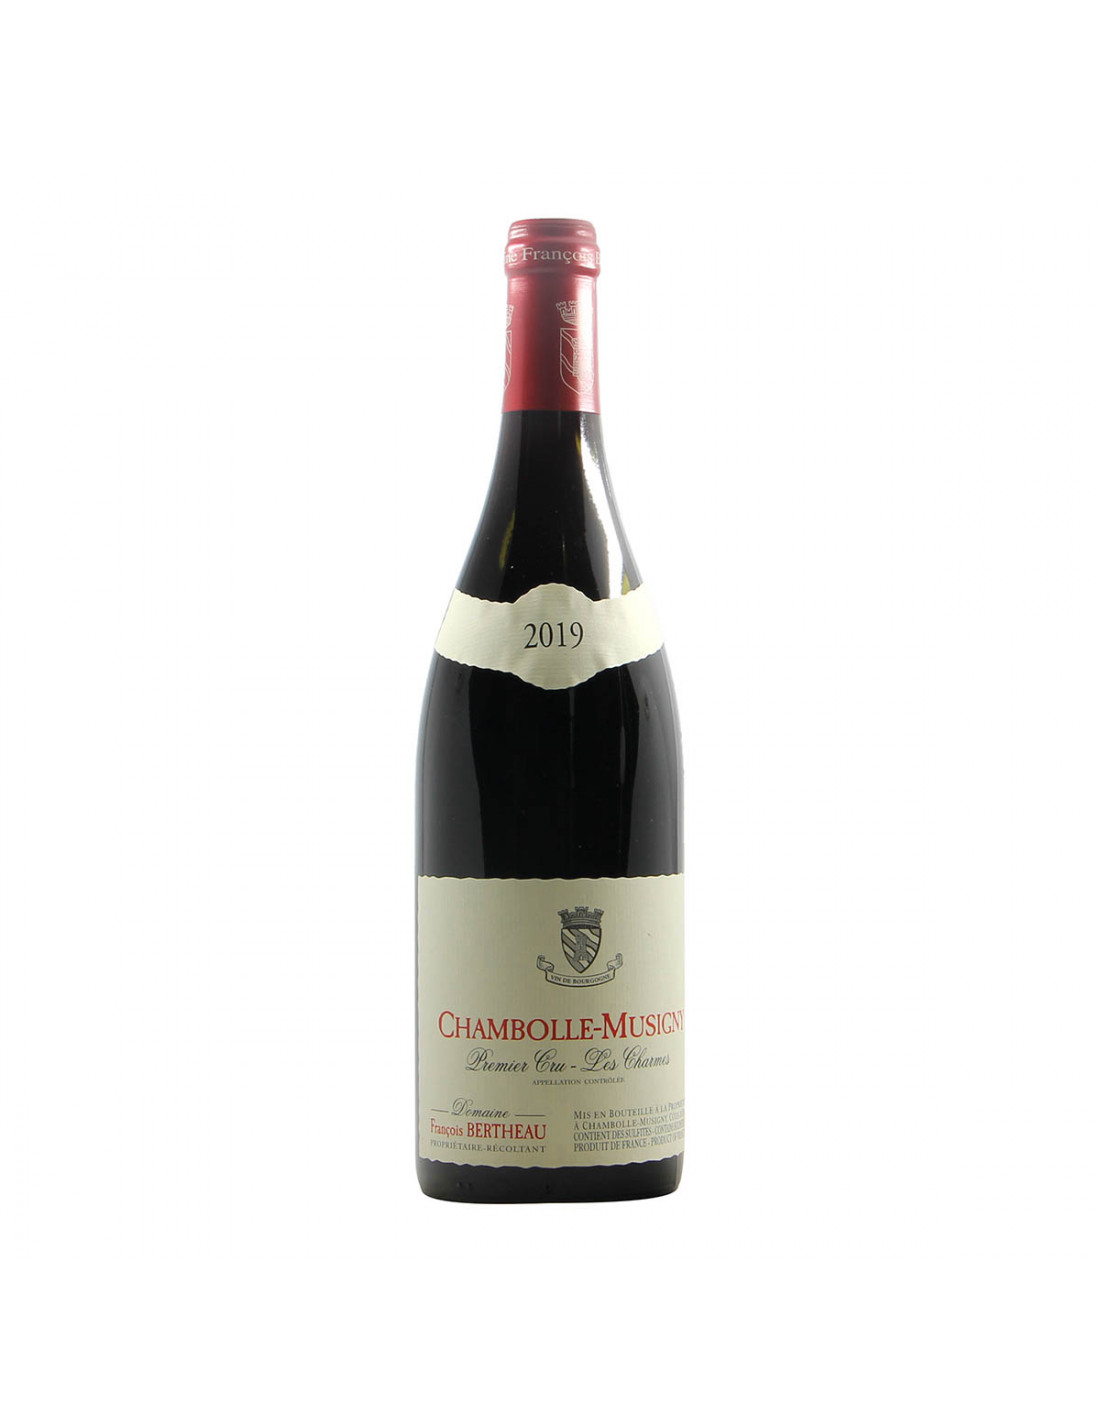 Francois Bertheau Chambolle Musigny 1er Cru Les Charmes 2019 Grandi Bottiglie